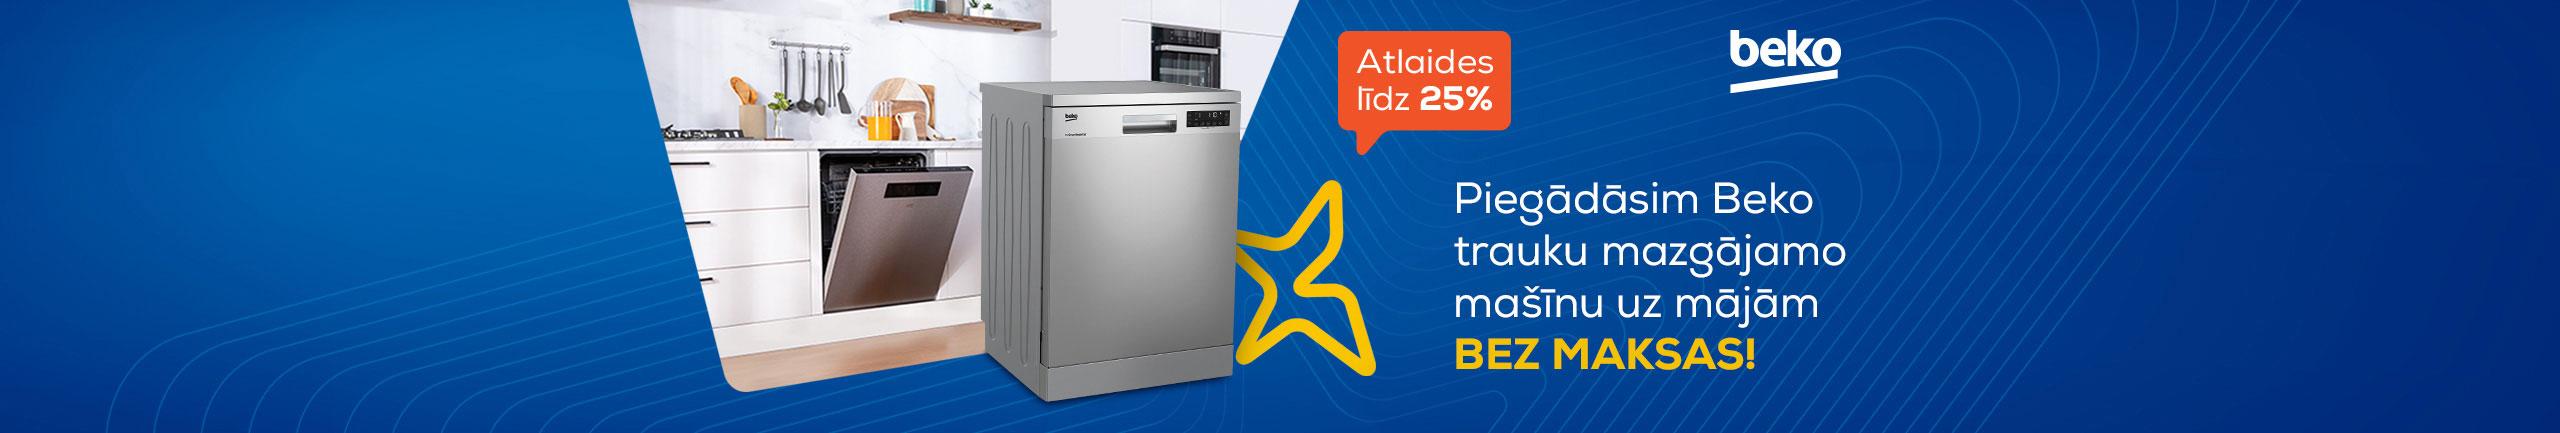 PL NPL Beko 25%